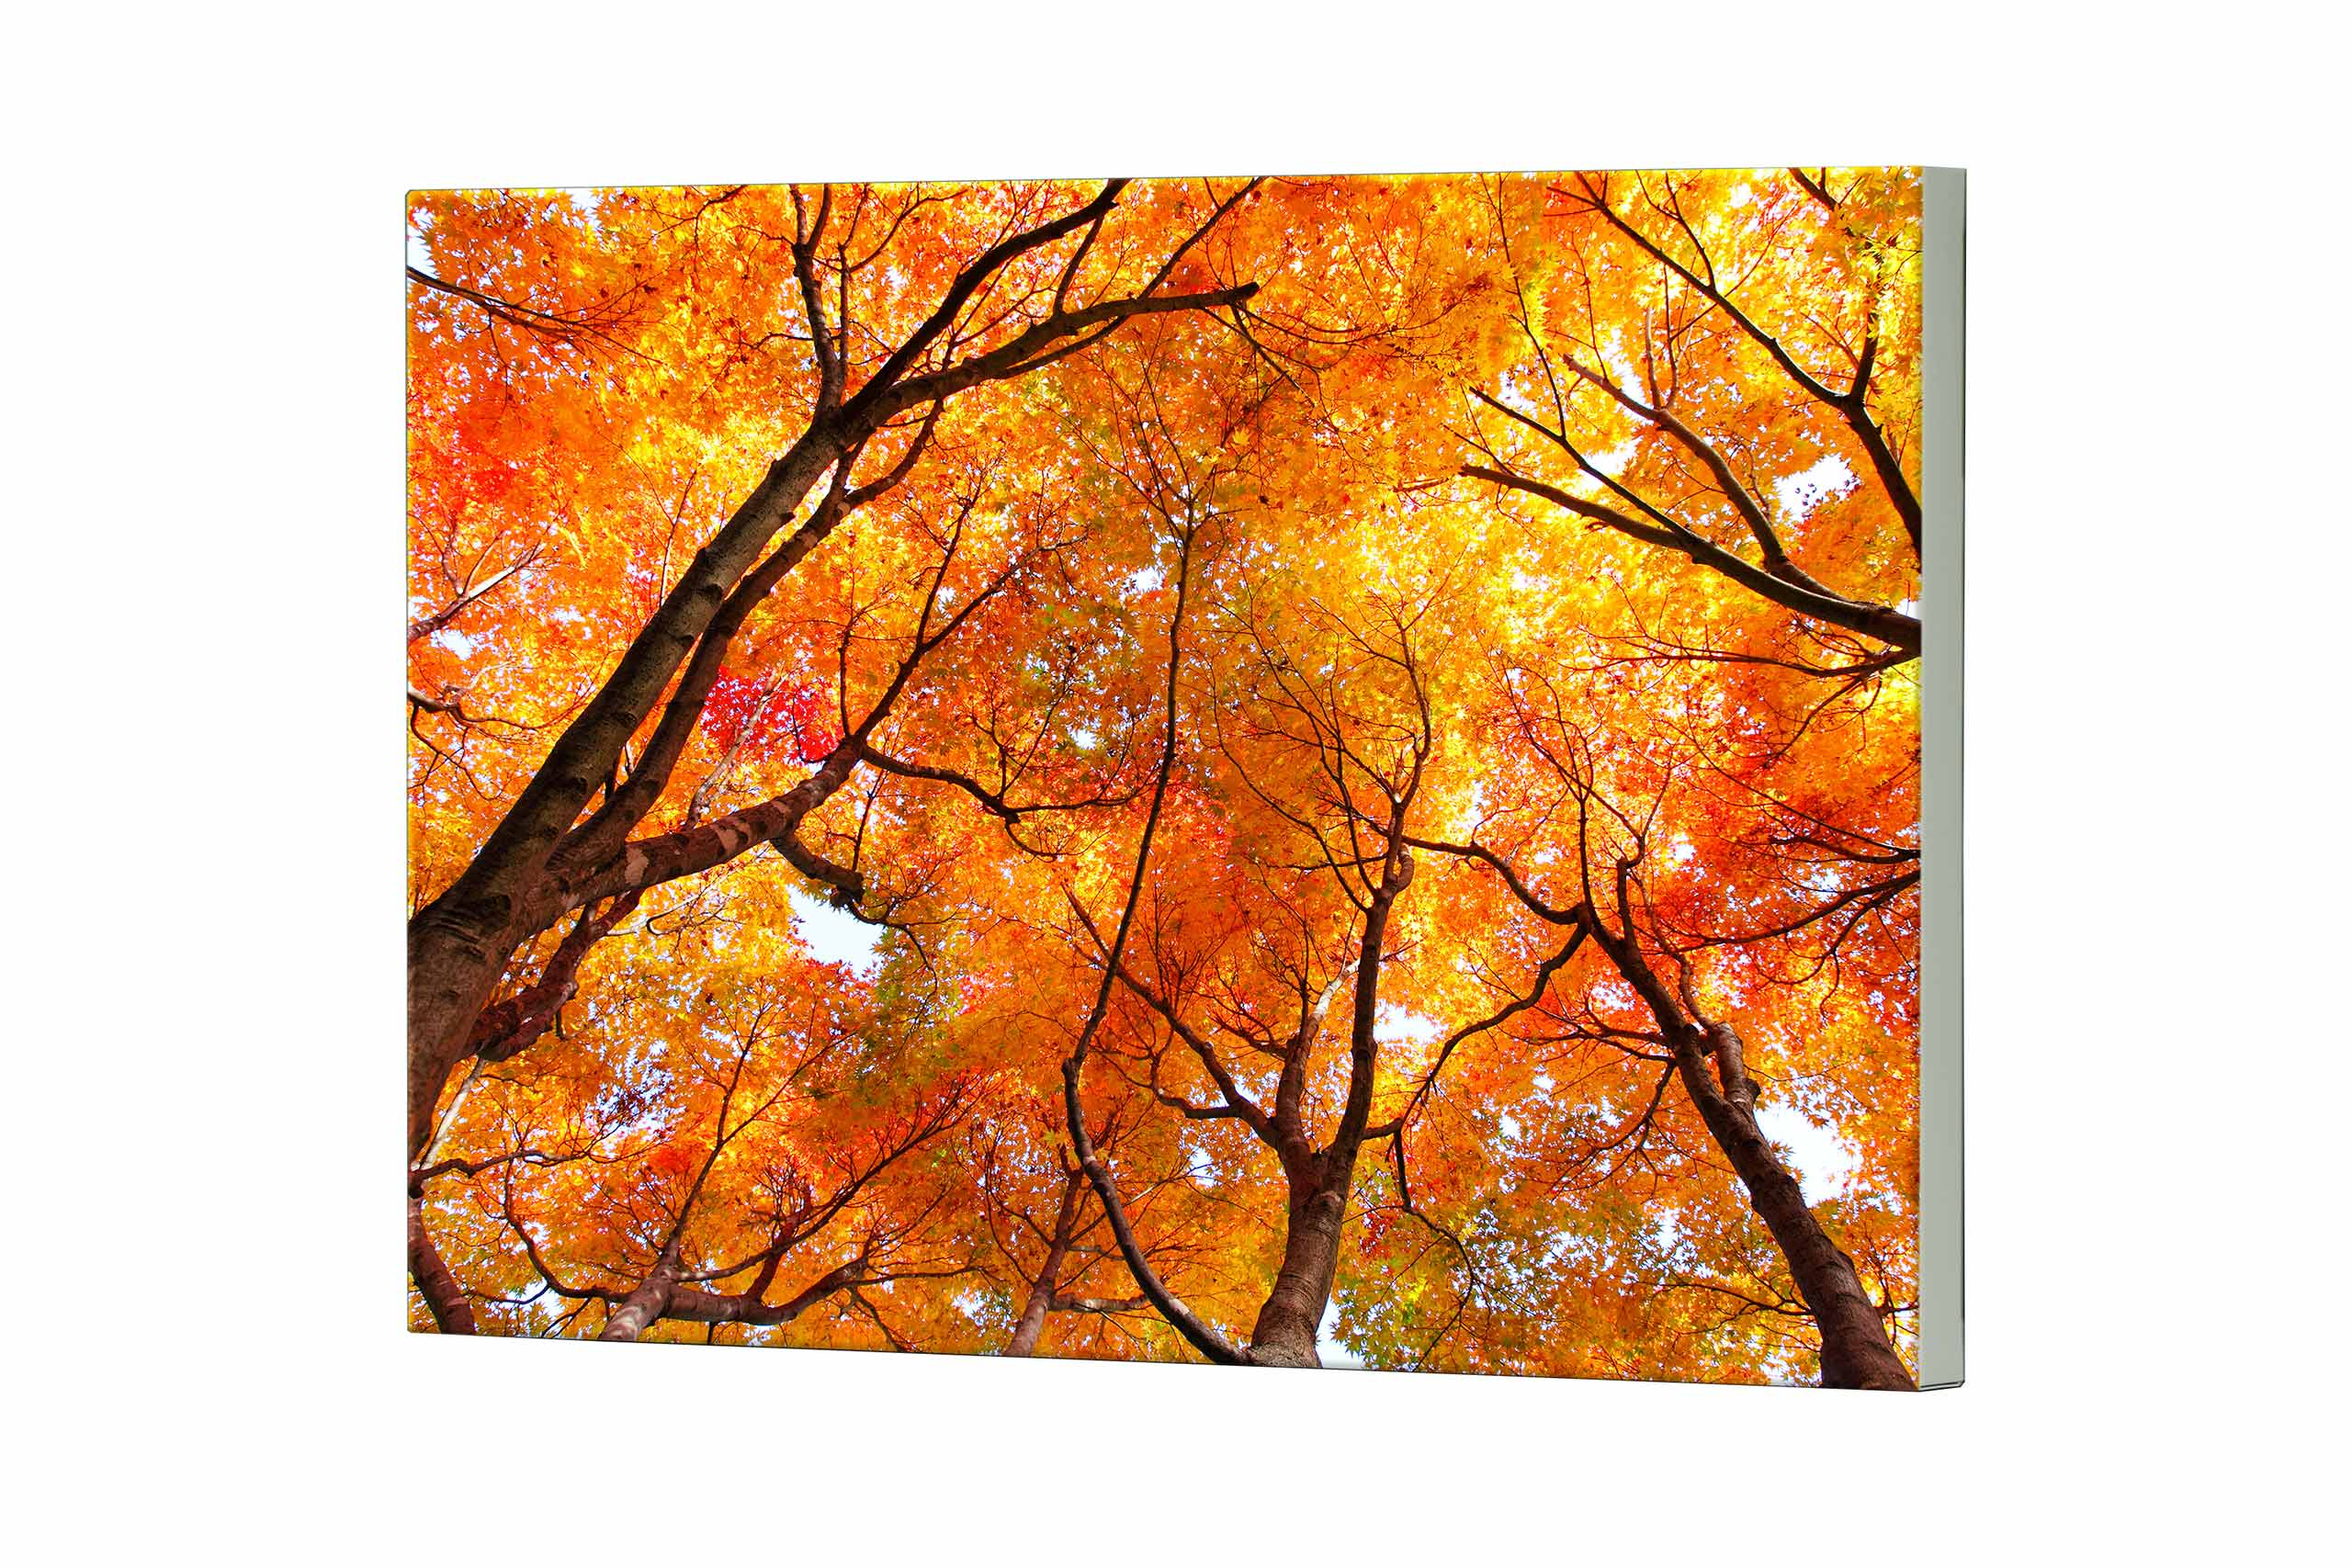 Magnettafel NOTIZ 80x60cm Motiv Bäume MDQ237 Motiv-Pinnwand